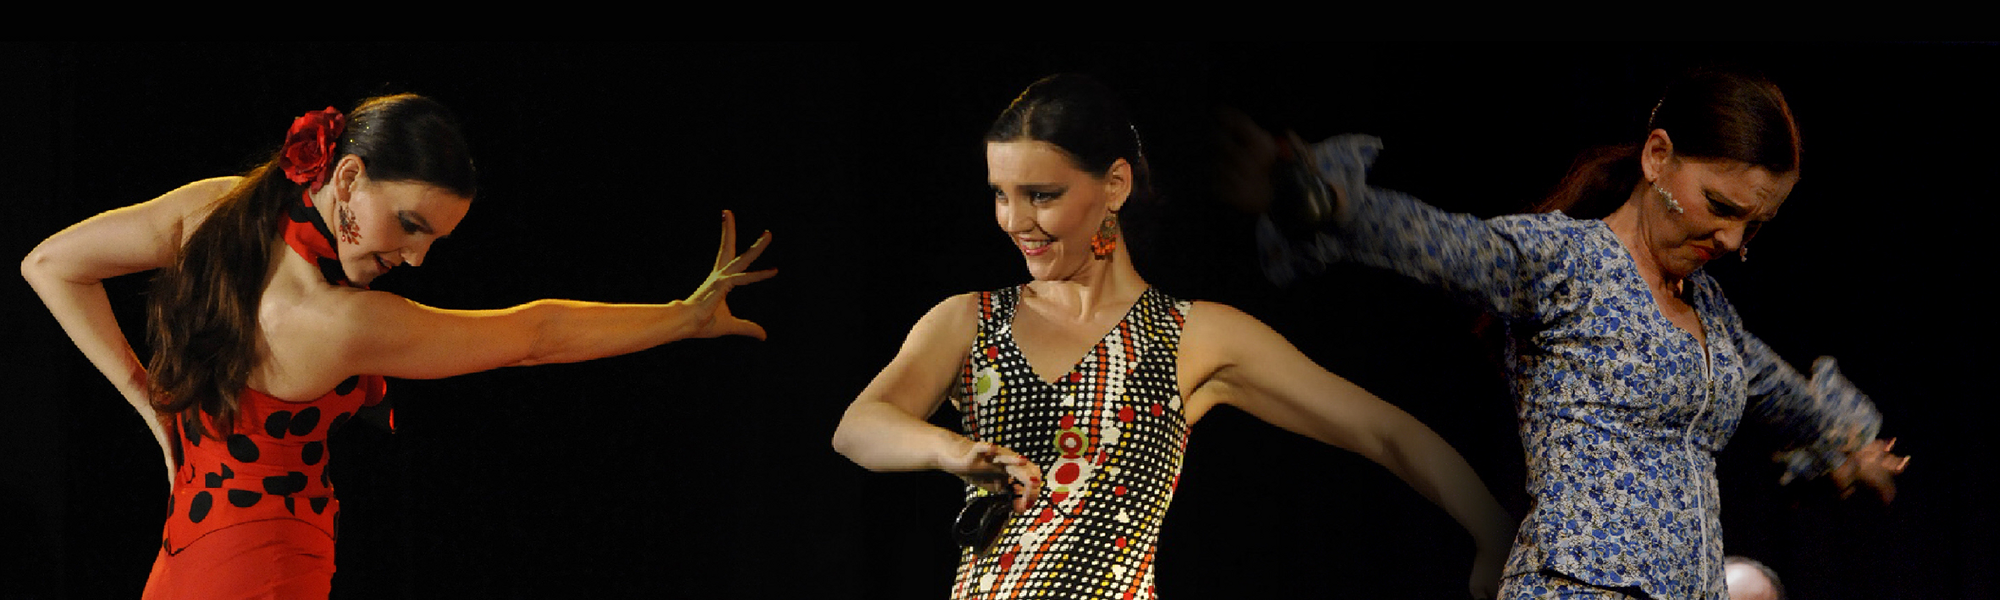 Flamenco Festival Berlin